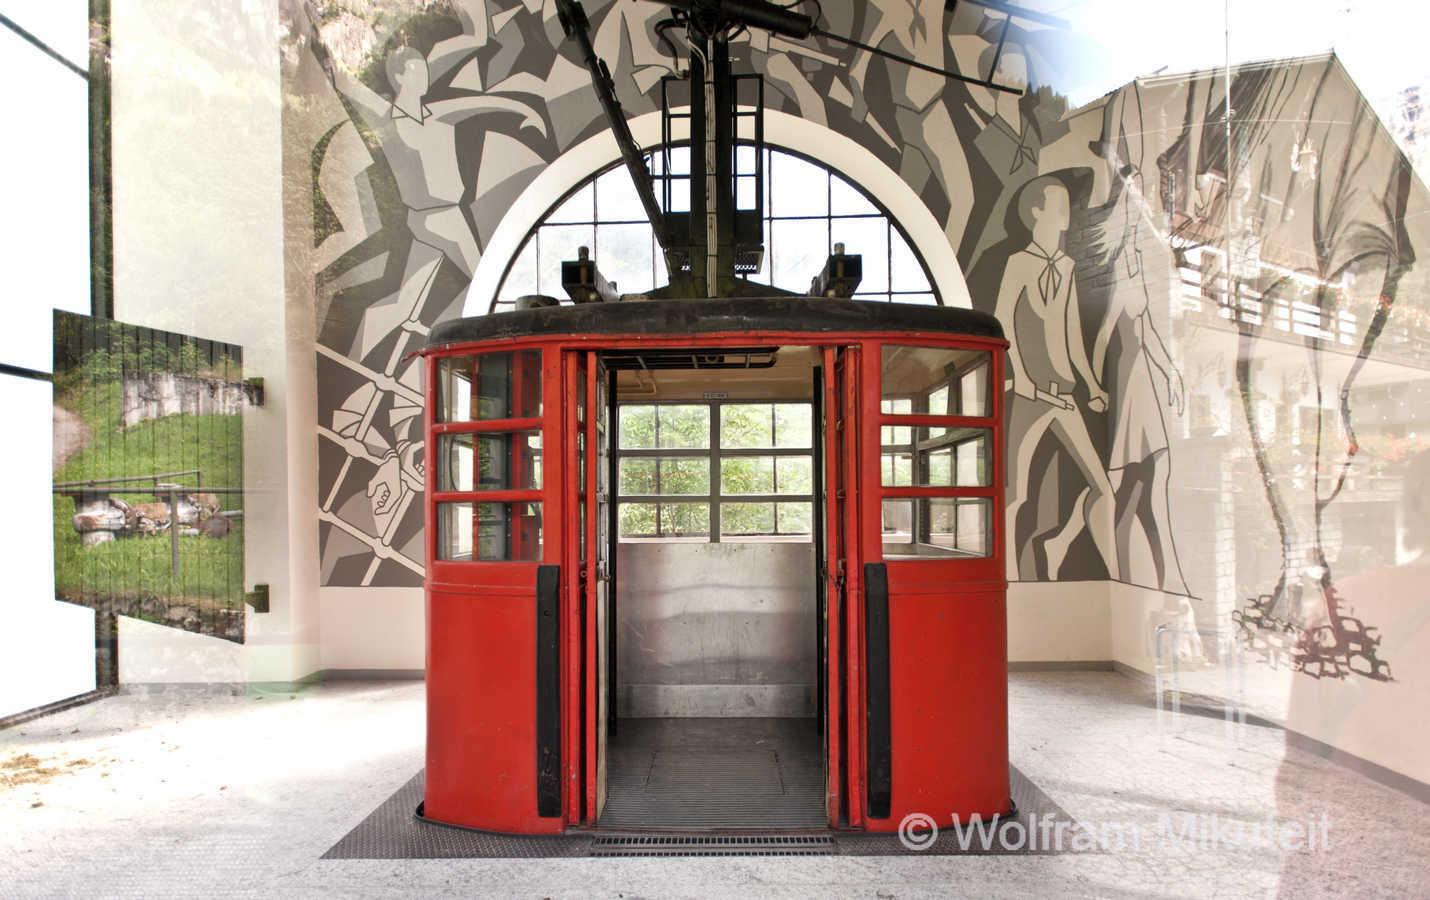 Kabinenbahn in Goglio